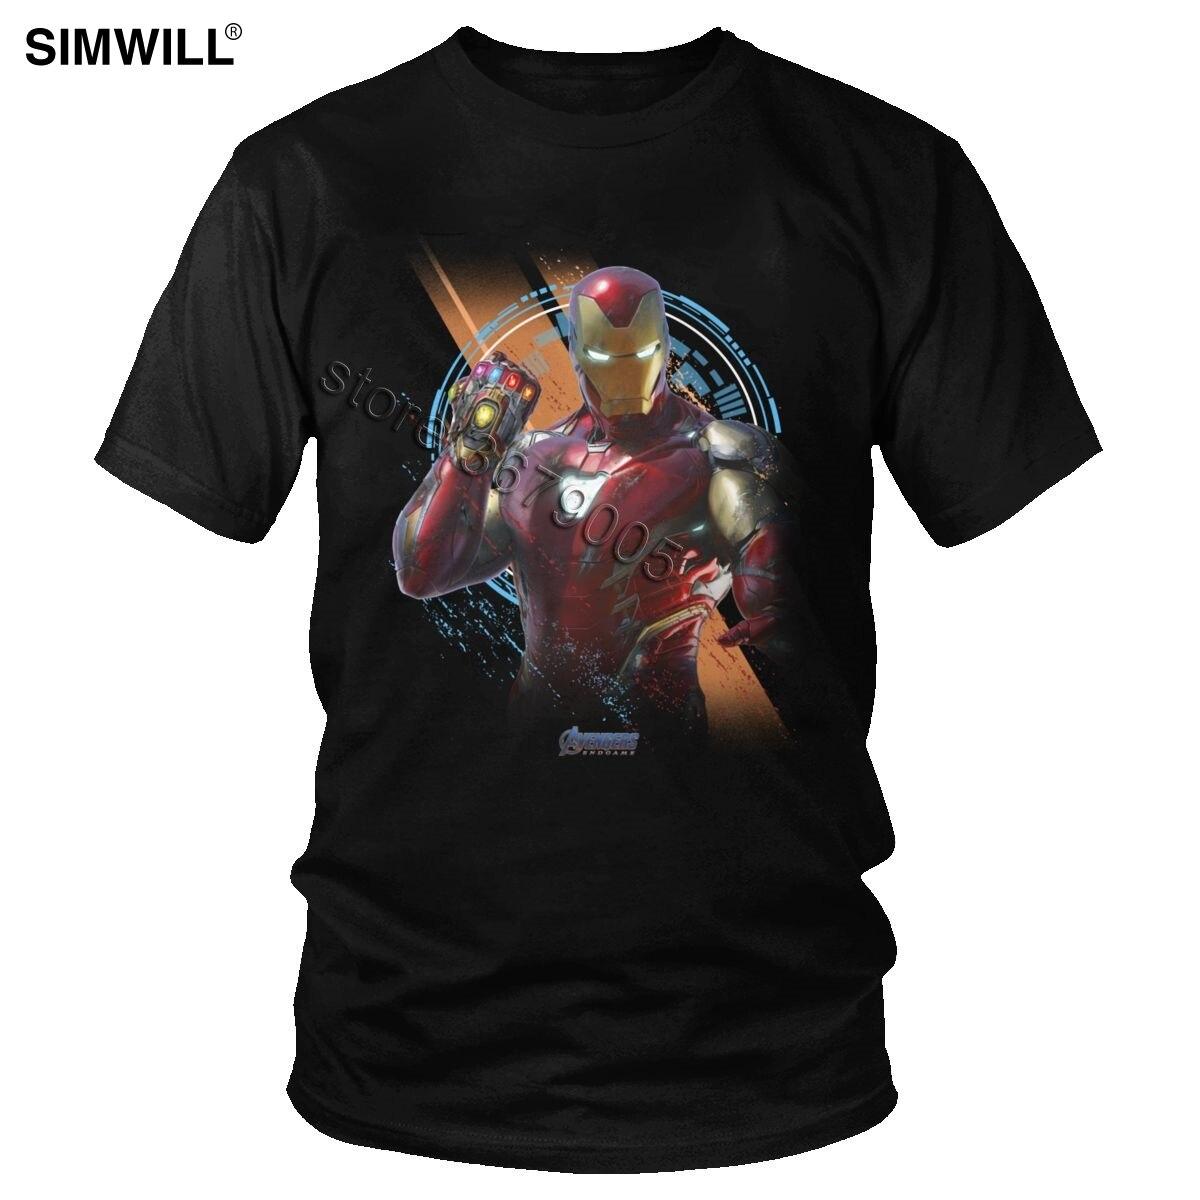 Vintage poderoso Iron Man Camiseta Infinity War Tee Cool Avengers Super Hero Marvel manga corta Camiseta algodón gráfico camiseta